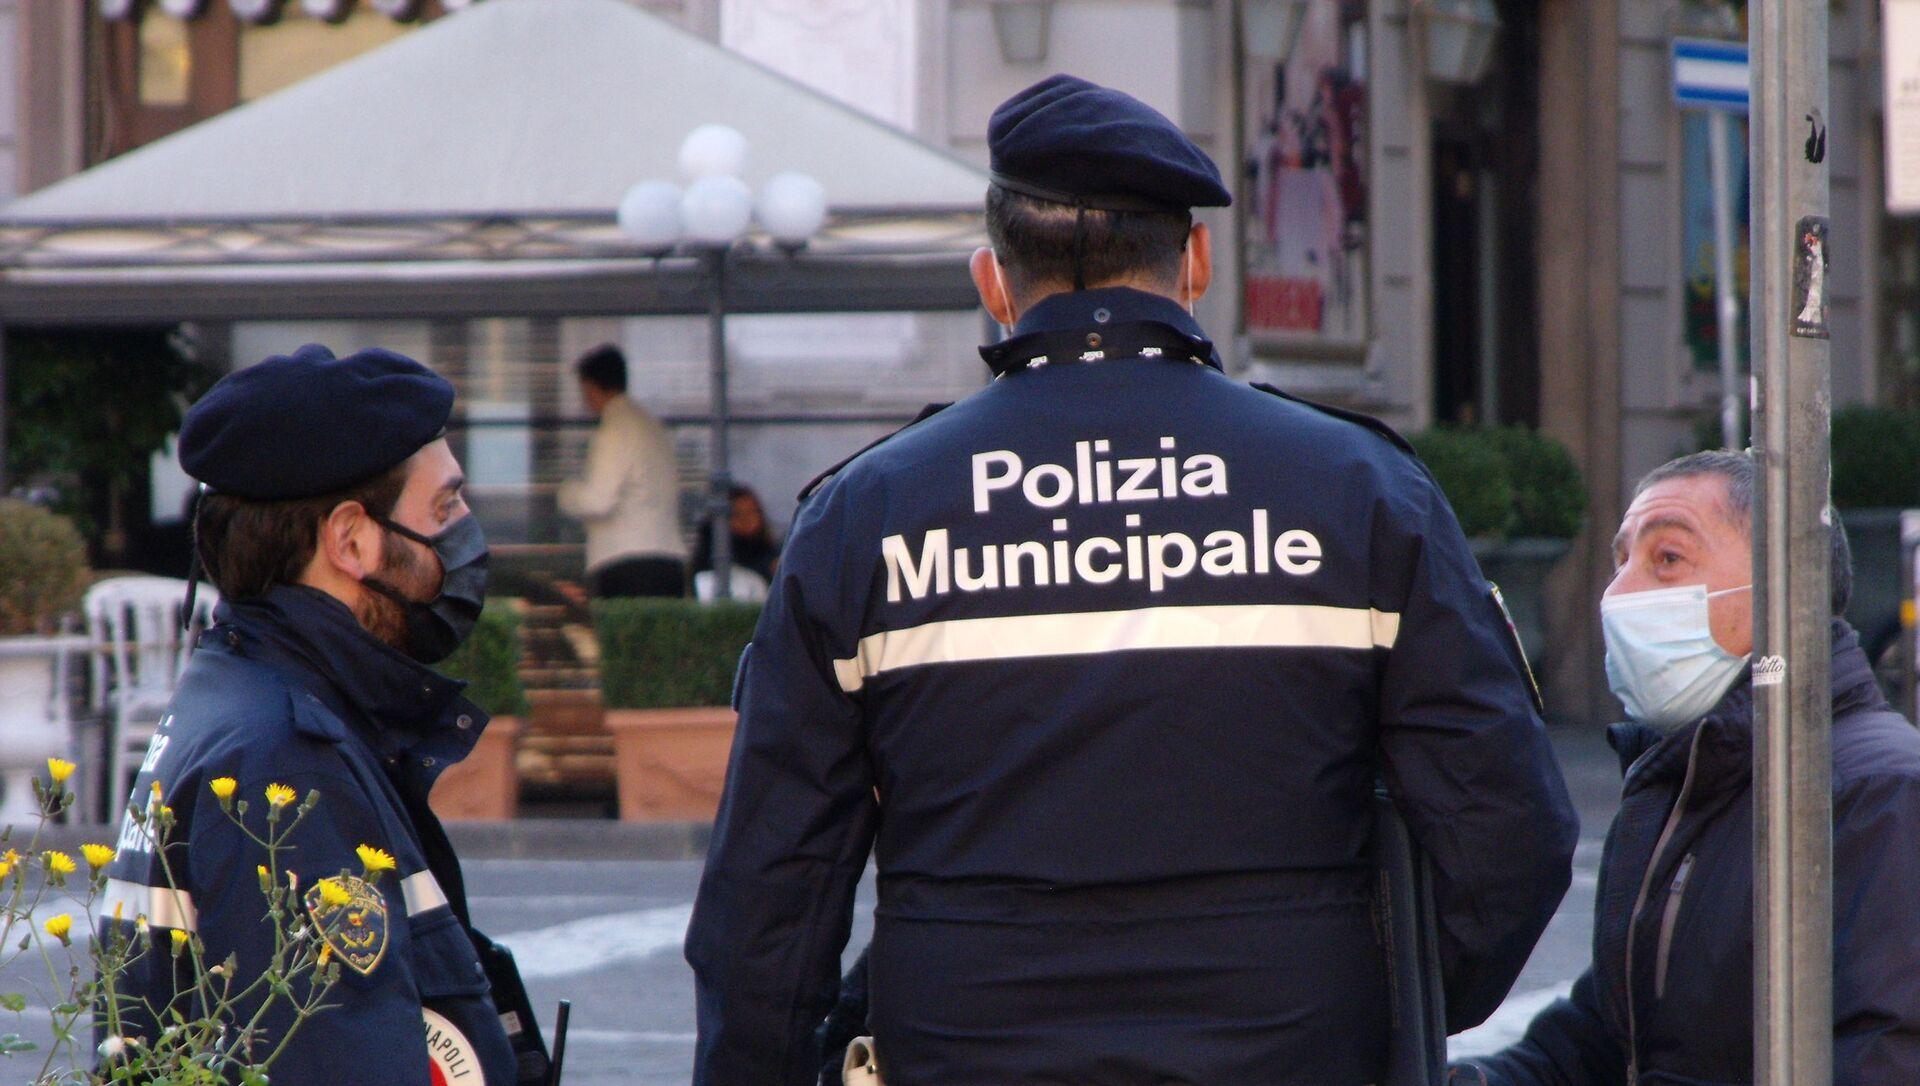 Napoli polizia municipale, uomo in mascherina  - Sputnik Italia, 1920, 05.04.2021